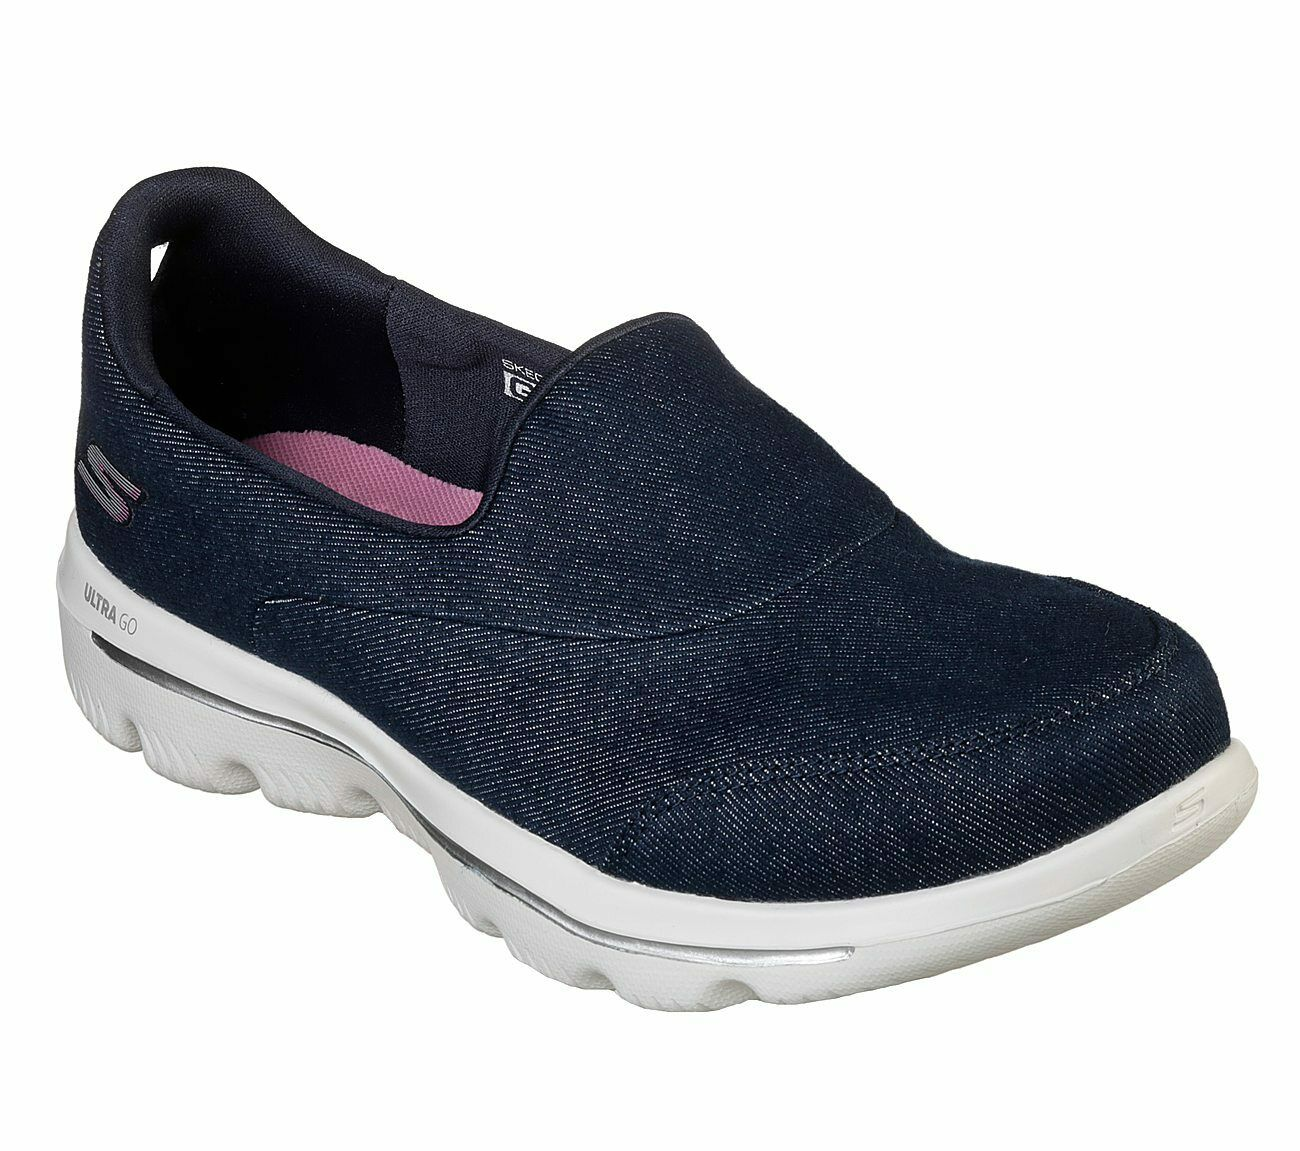 Skechers gowalk evolution ultra-belief-x sneakers 15739 women